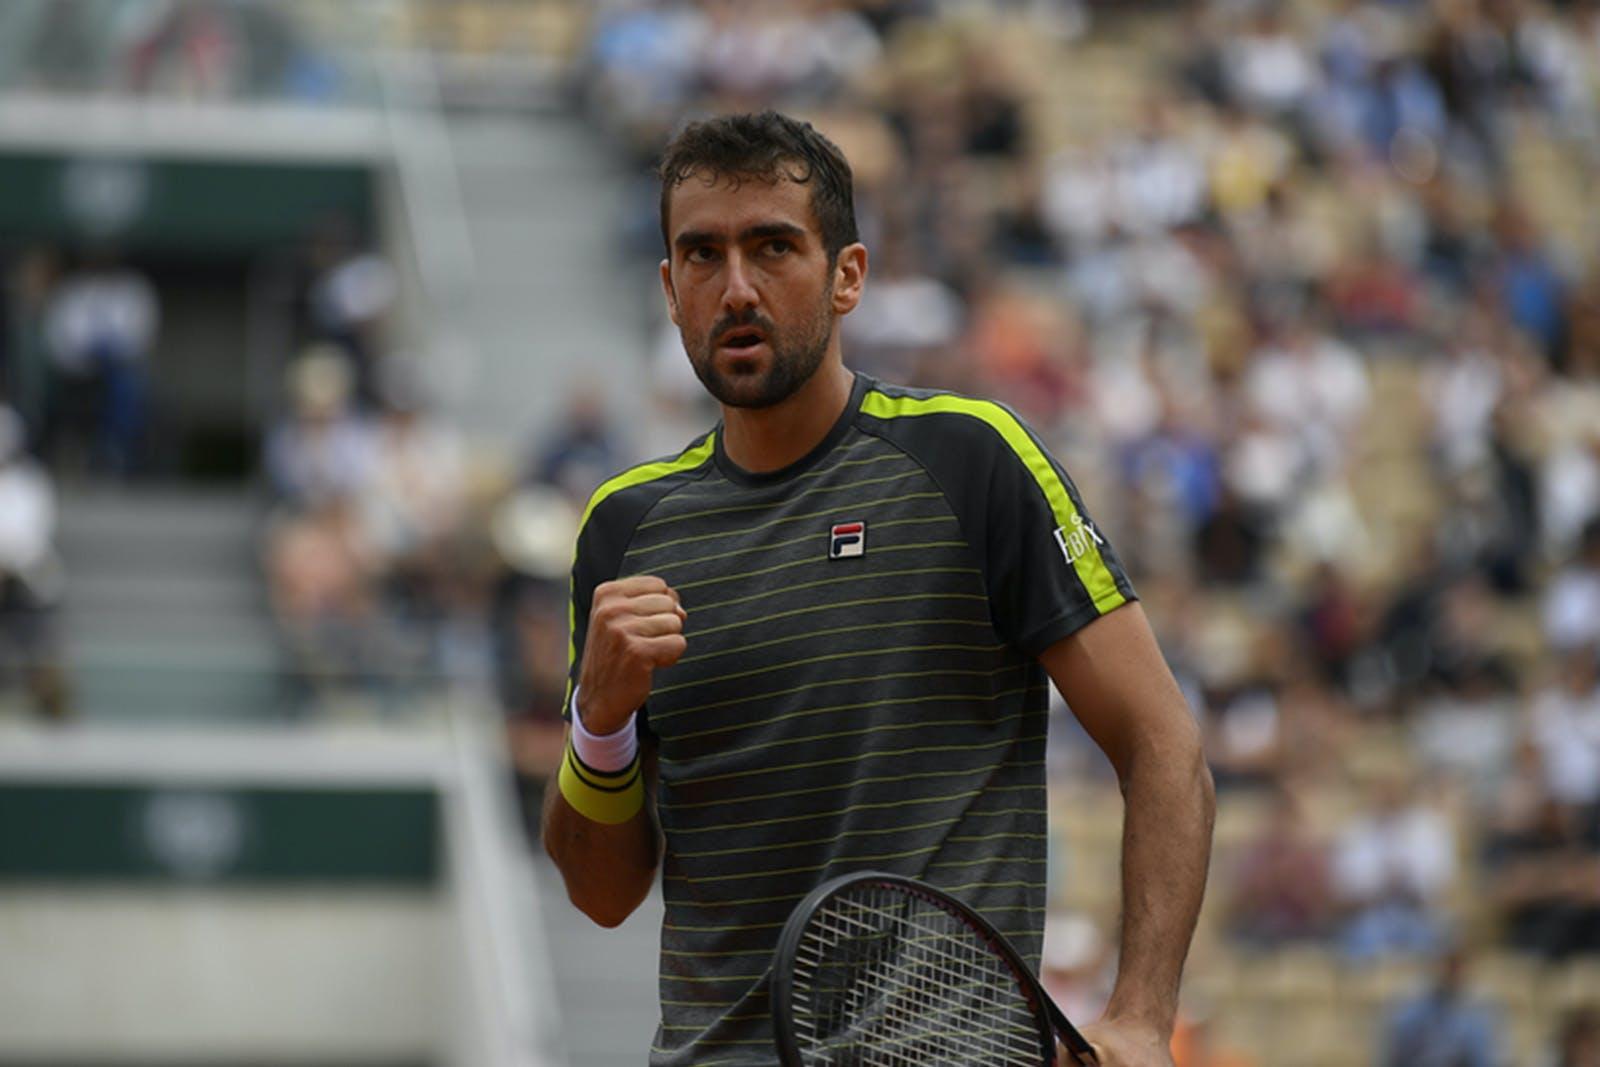 Roland-Garros 2019 - Marin Cilic